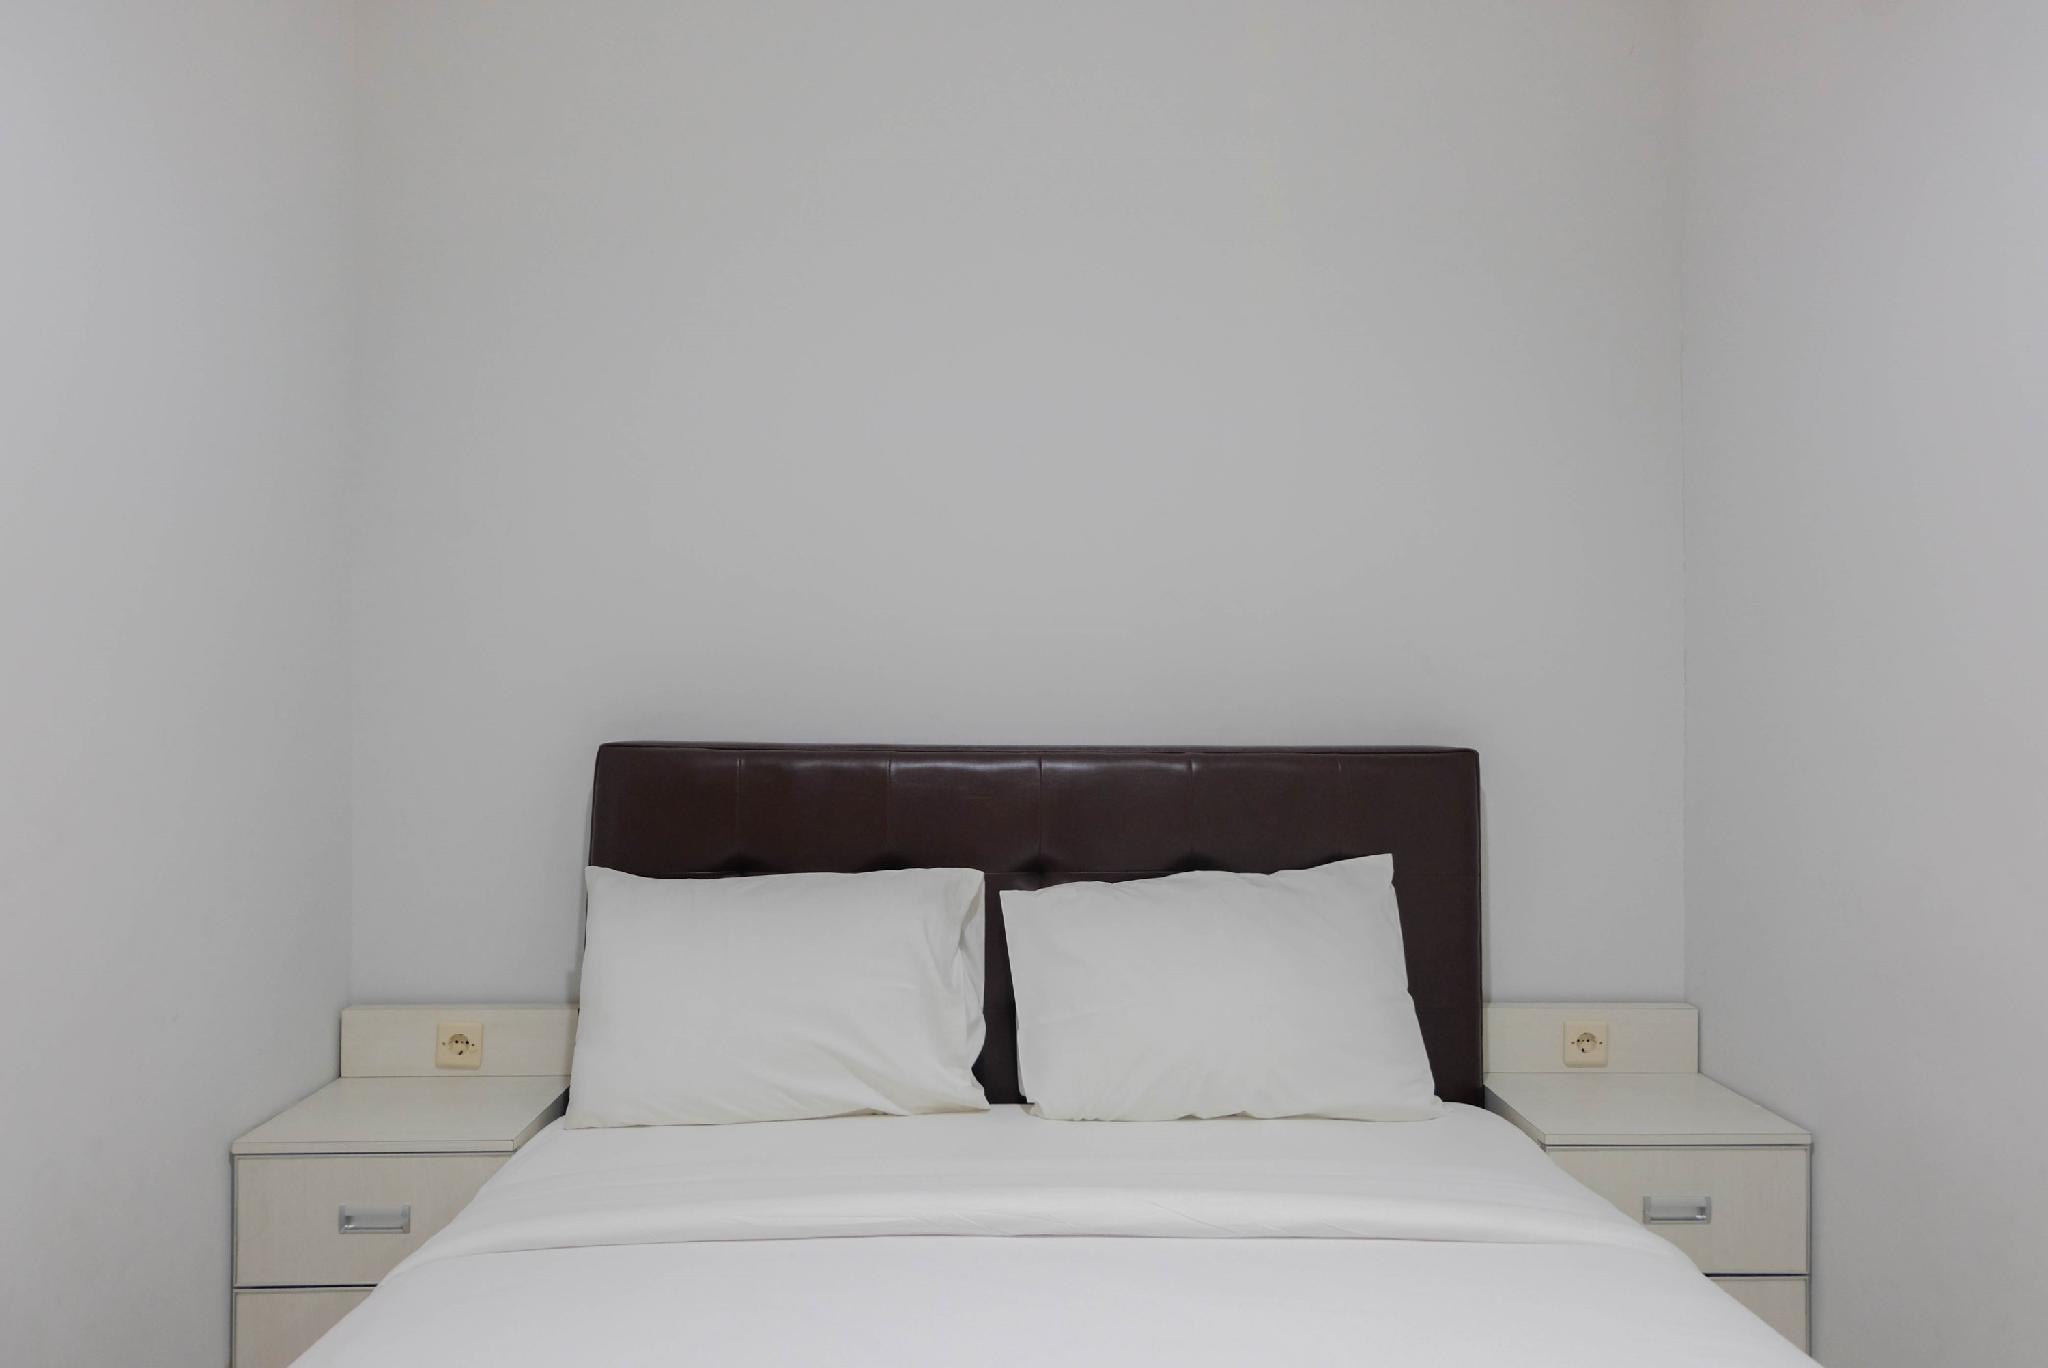 Luxurious 2BR Paddington Heights Apt By Travelio